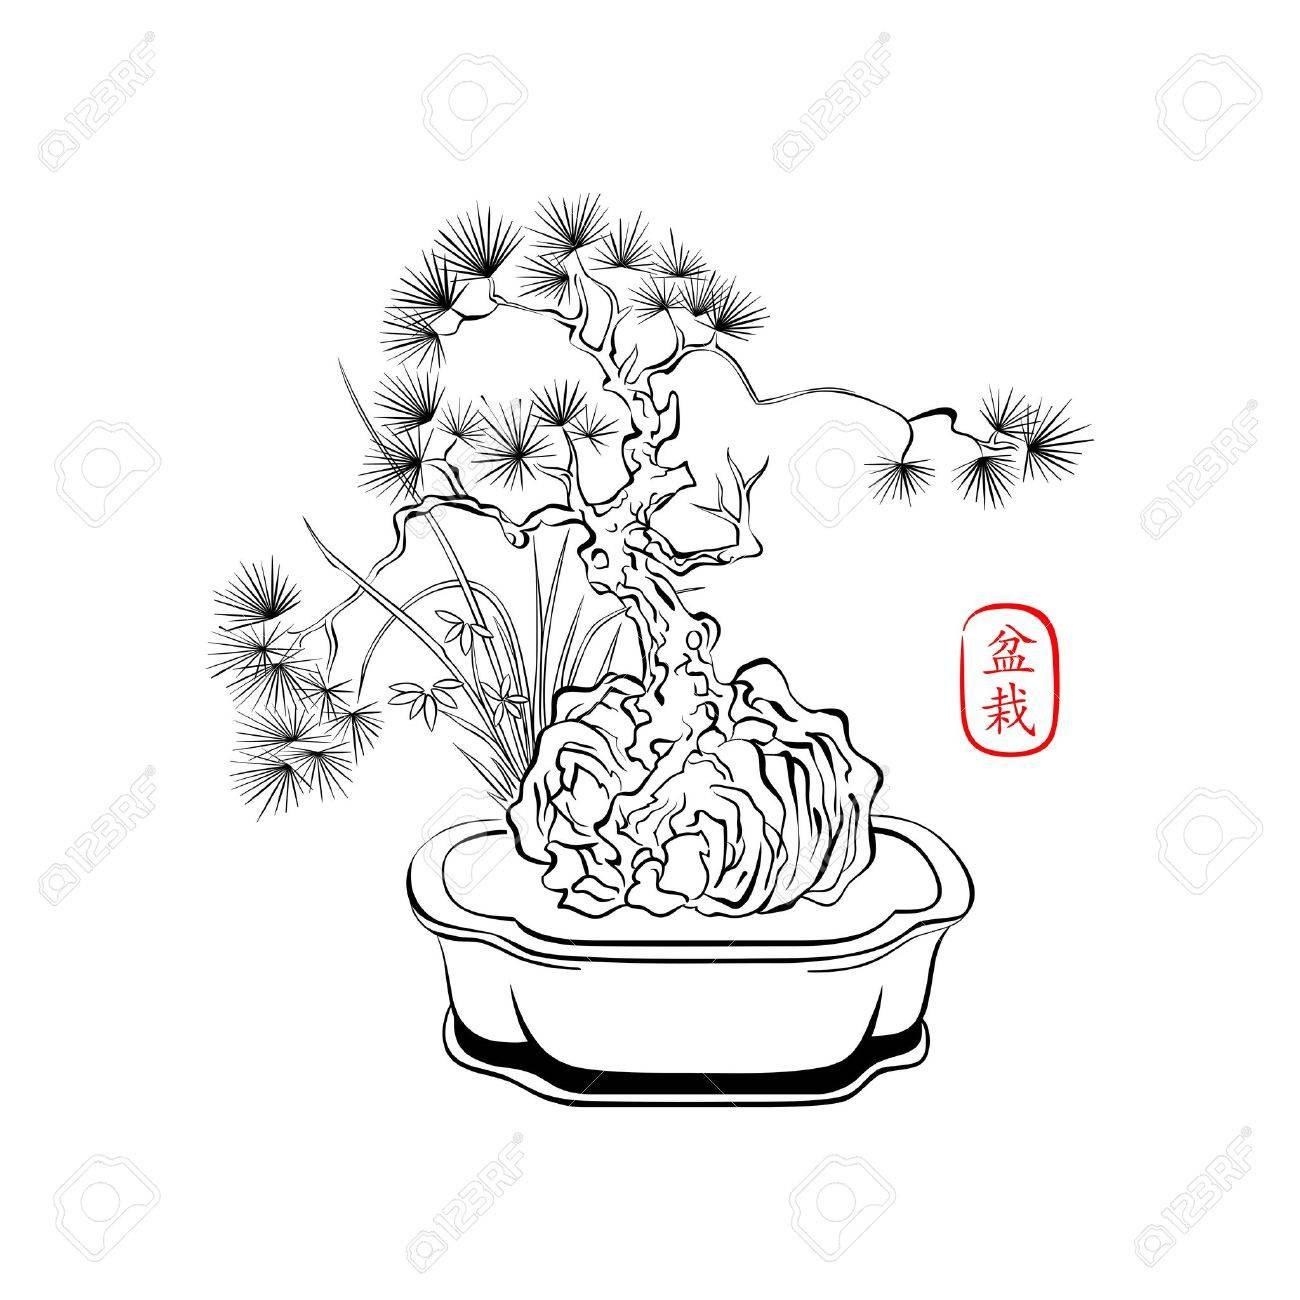 How To Draw A Bonsai Tree Step By Step Bonsai Tree